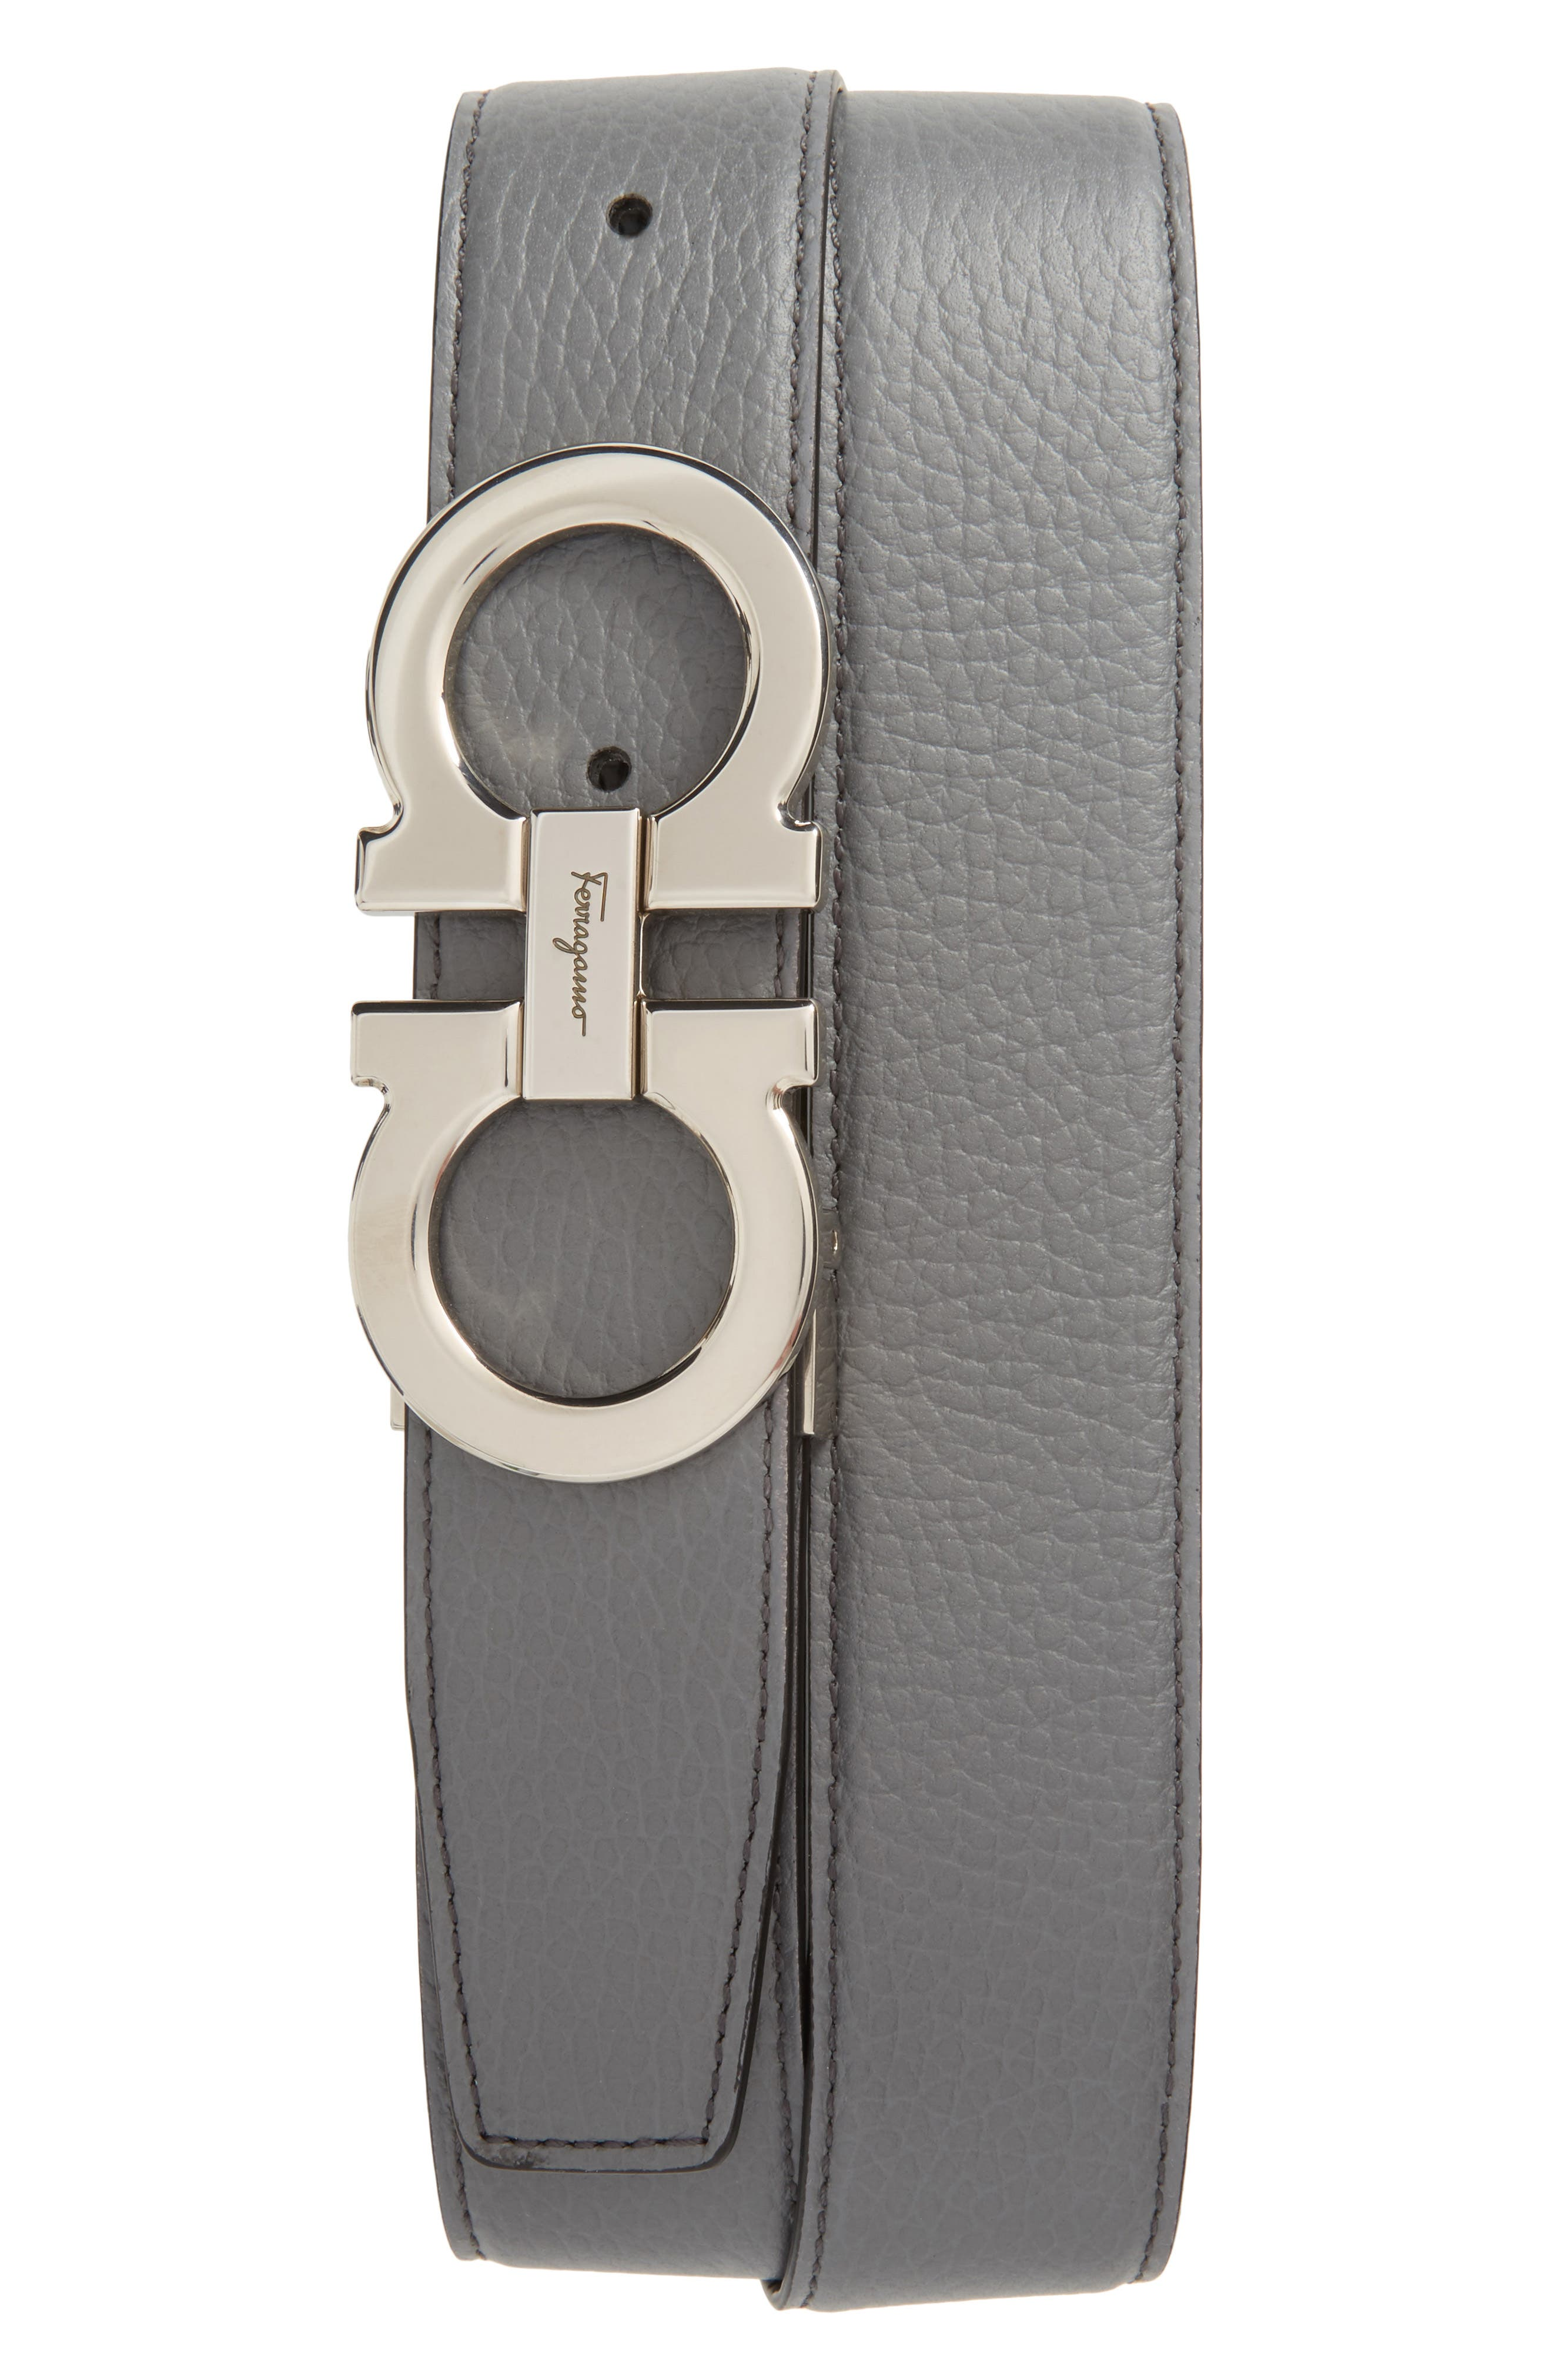 Faceted Double Gancio Reversible Leather Belt,                             Main thumbnail 1, color,                             Grey/ Black